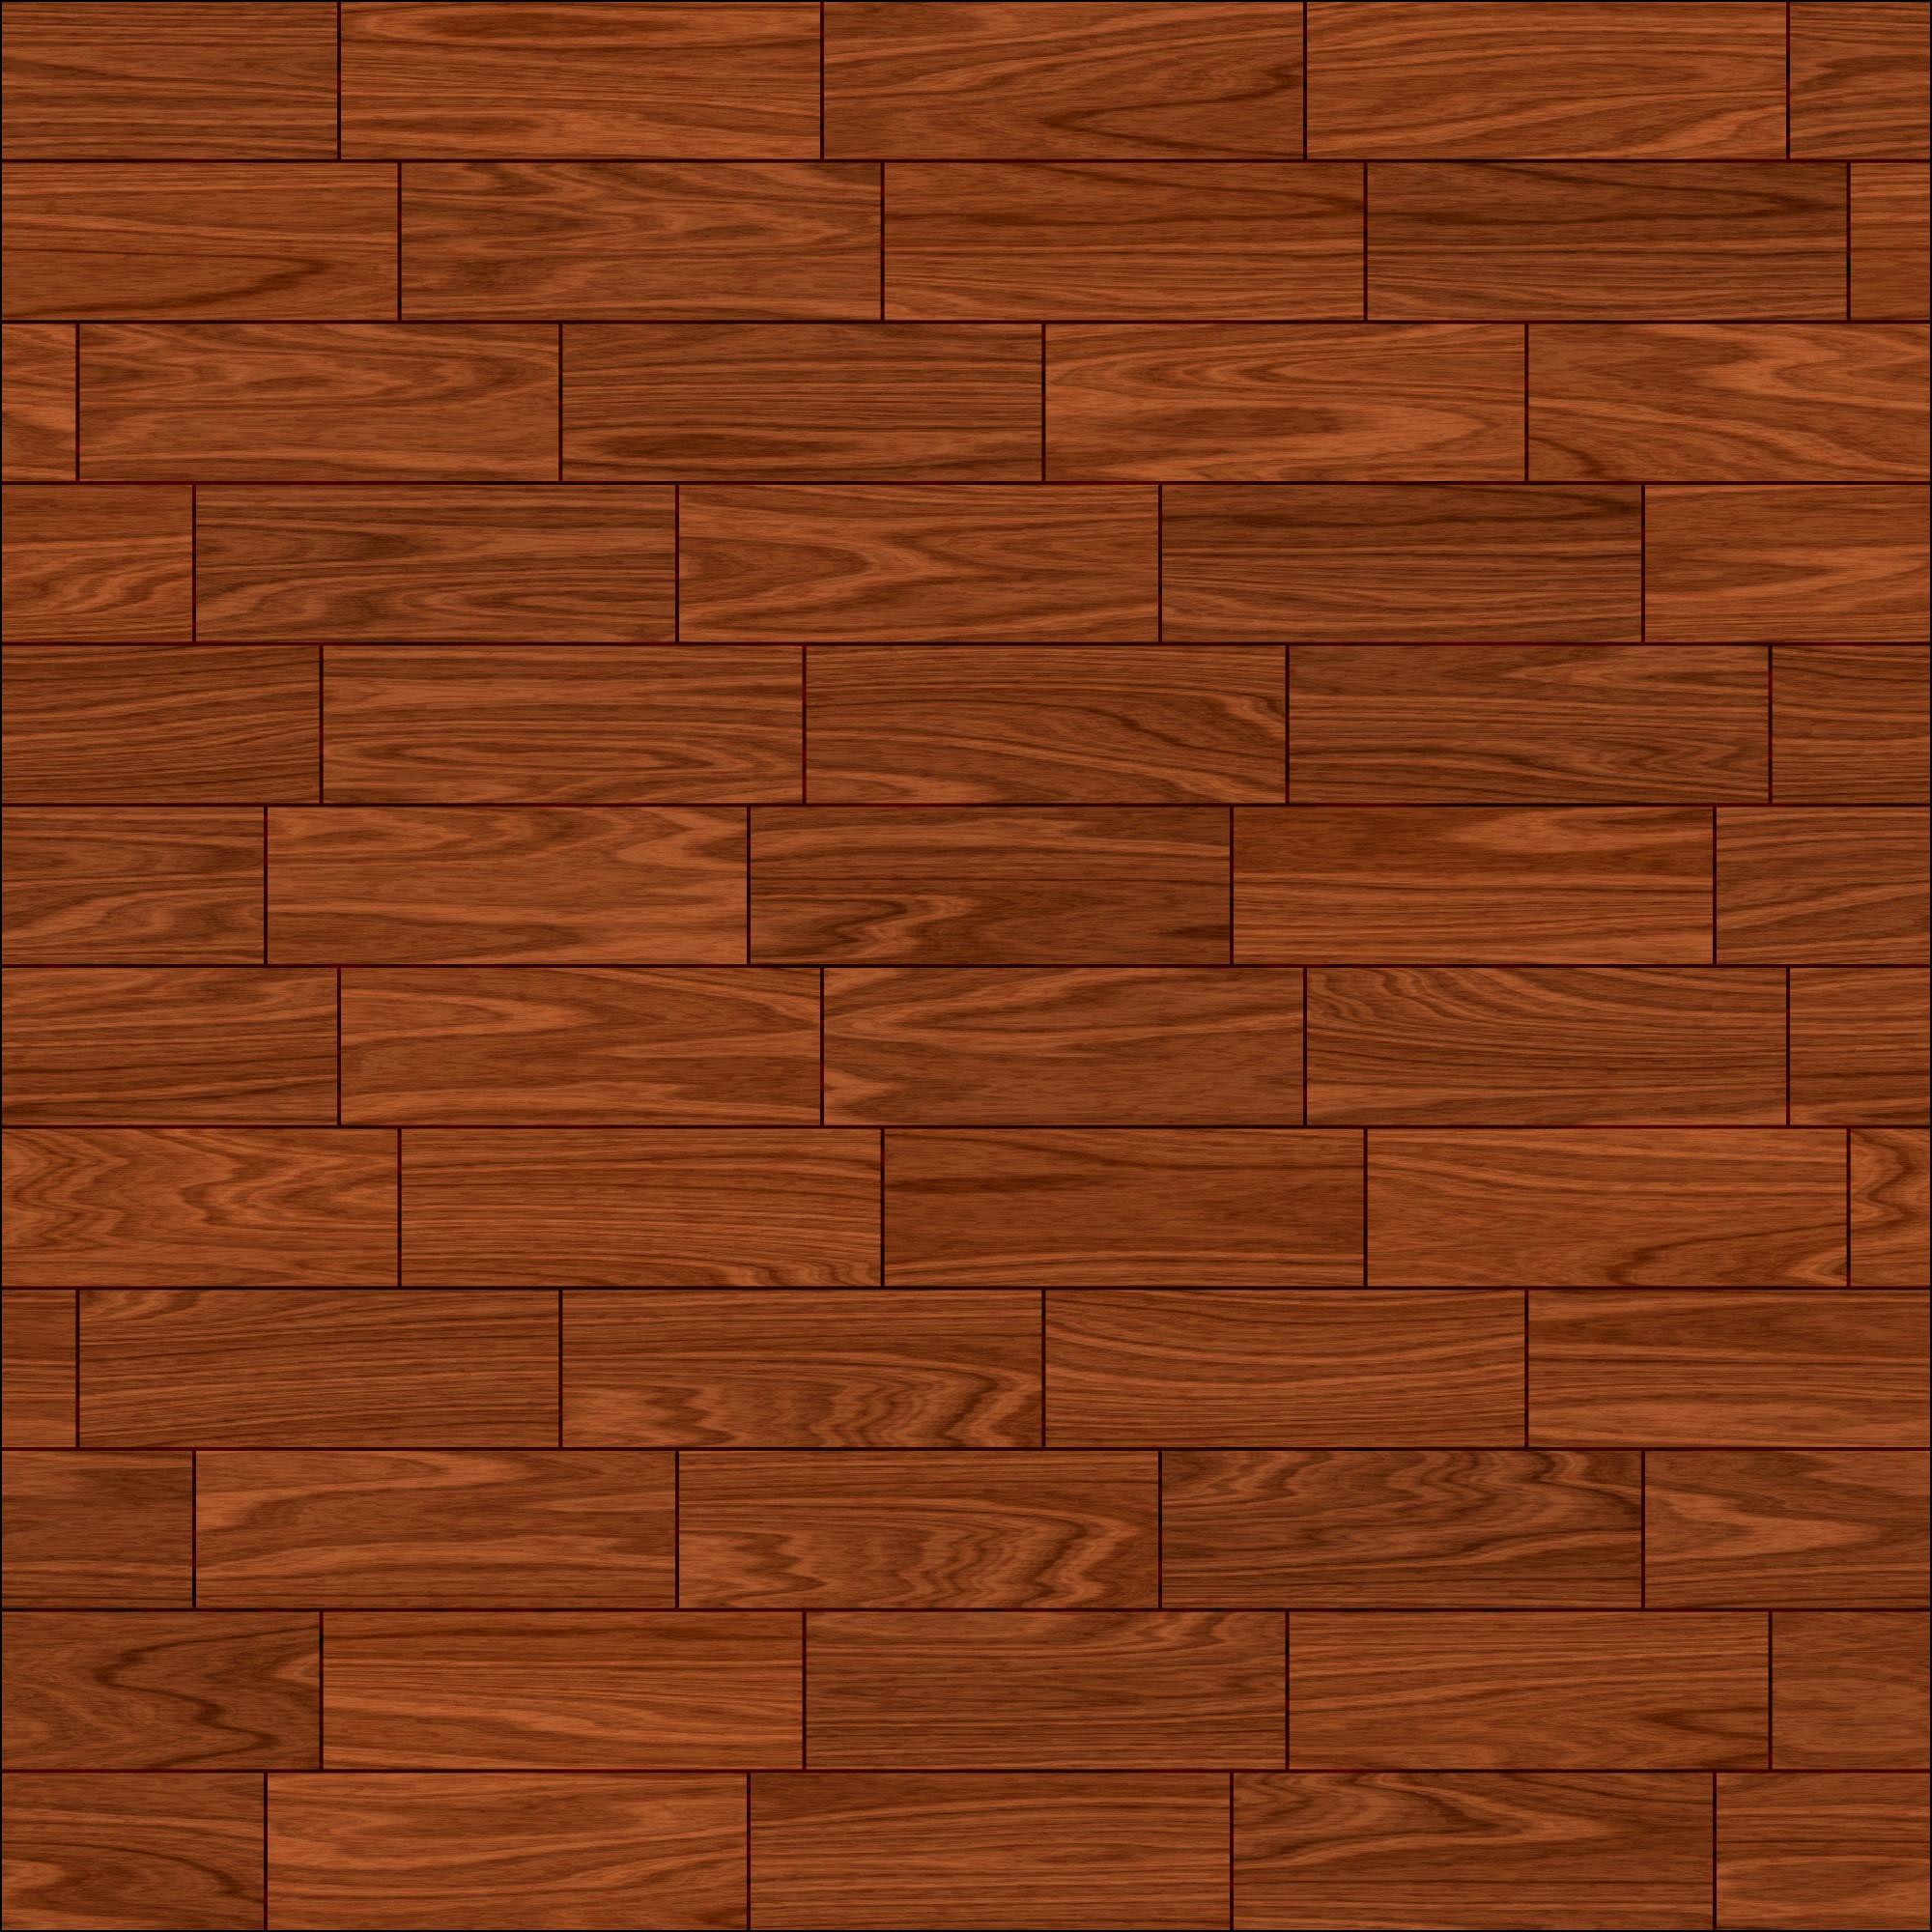 bruce hardwood floors lowes of wide plank flooring ideas in wide plank wood flooring lowes galerie nice wide plank flooring installation guide for wood floor of